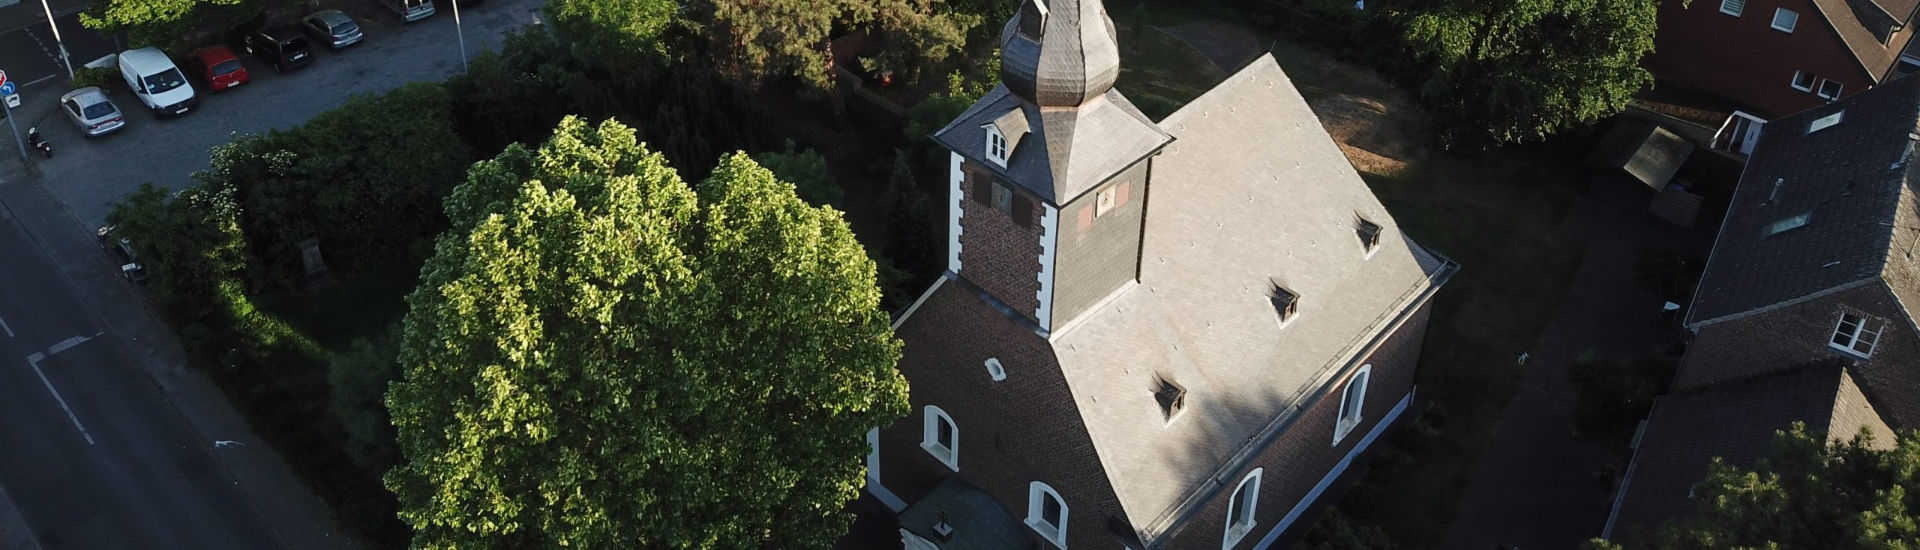 Evangelische Kirche Kapellen, Neukirchen, Wevelinghoven